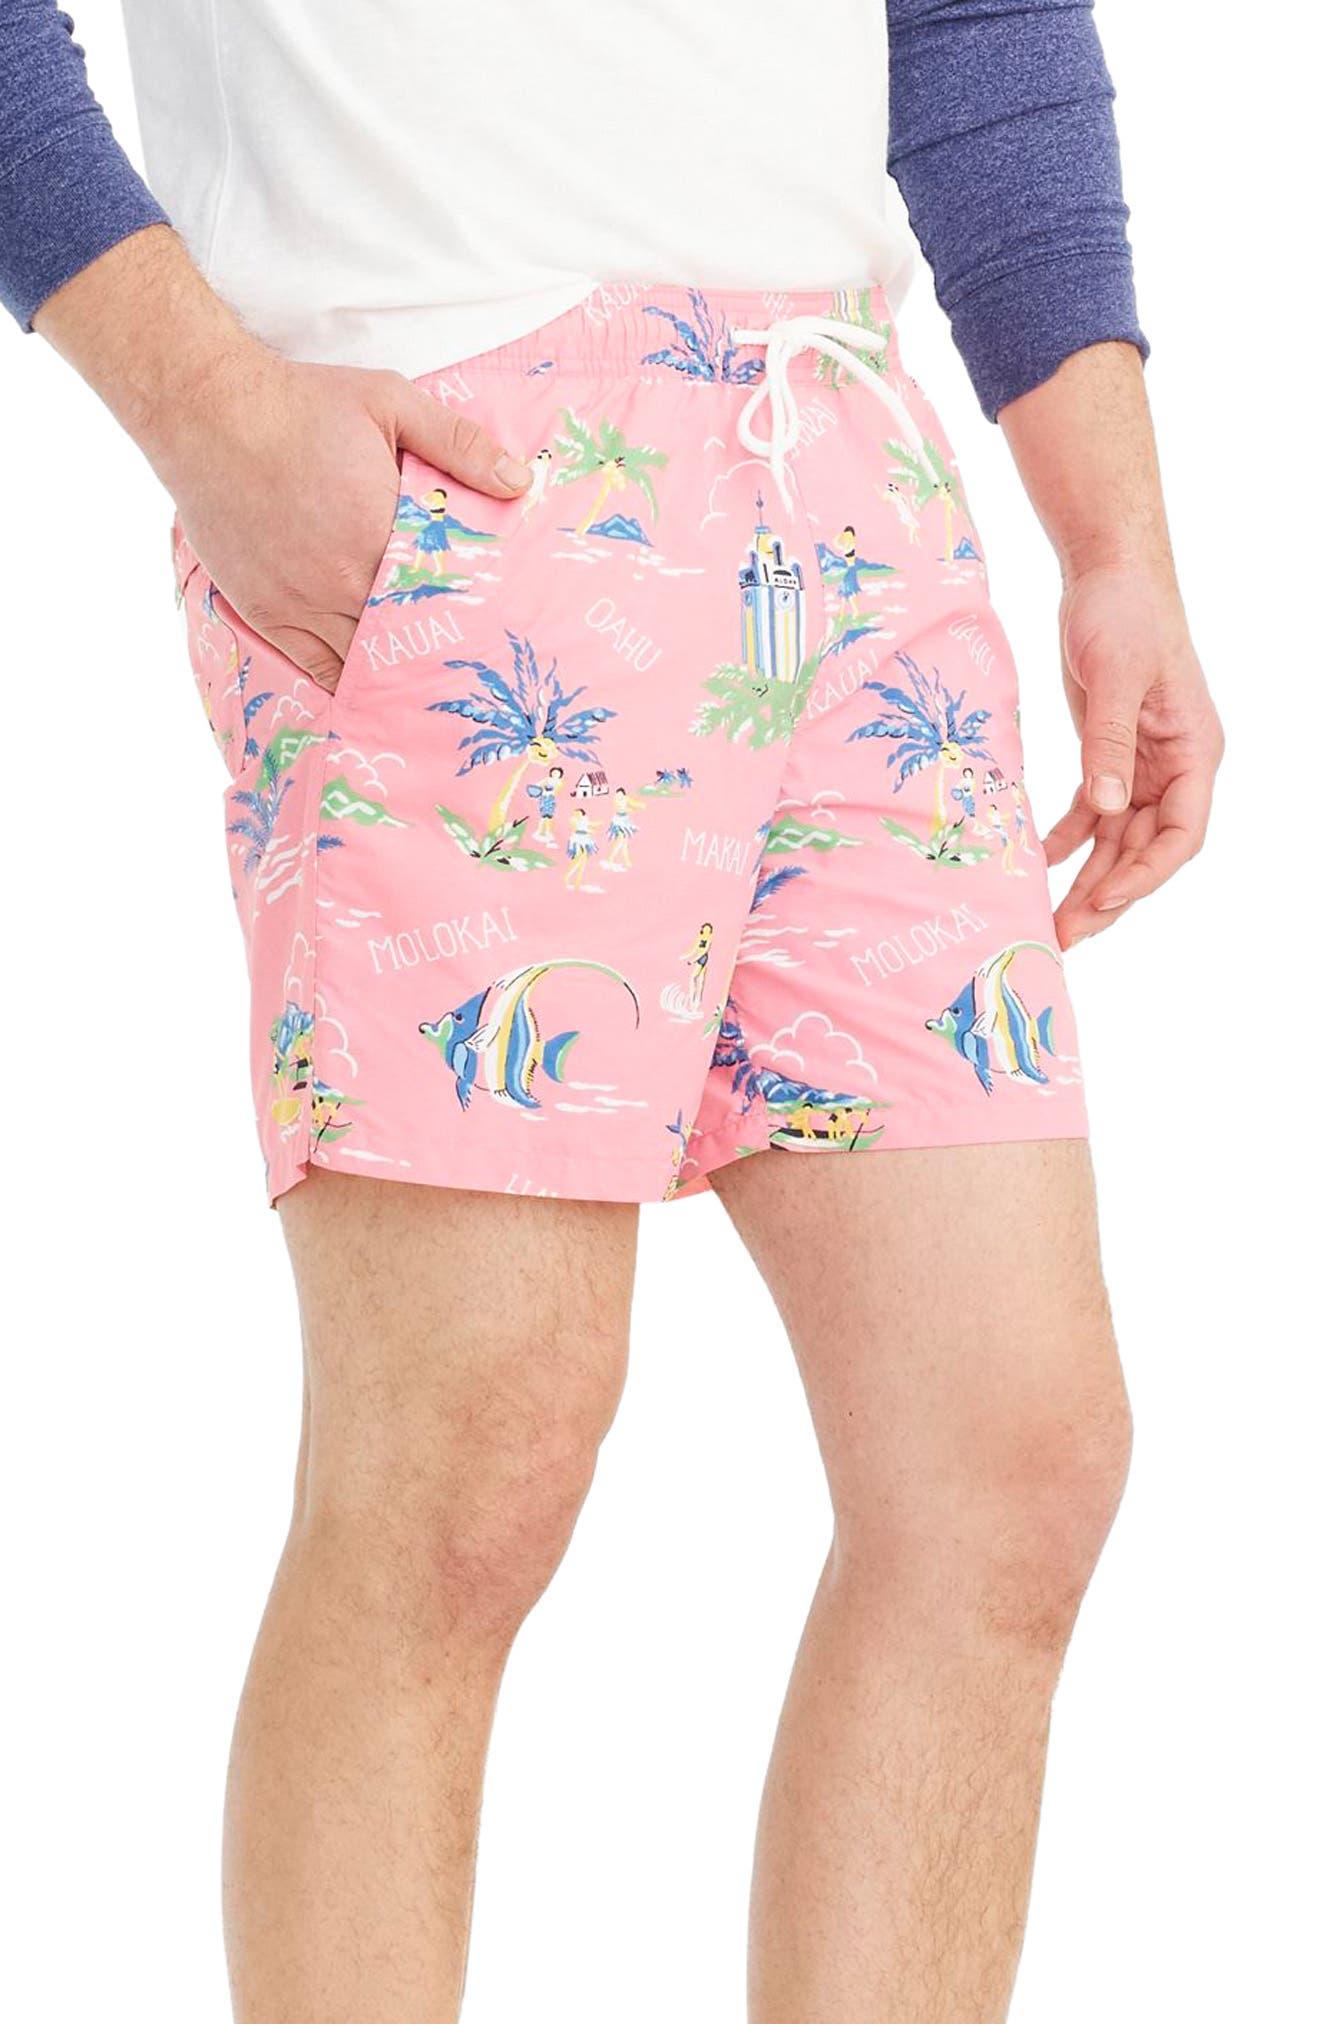 J.Crew Hawaii Print Swim Trunks,                             Alternate thumbnail 3, color,                             Pink Seas